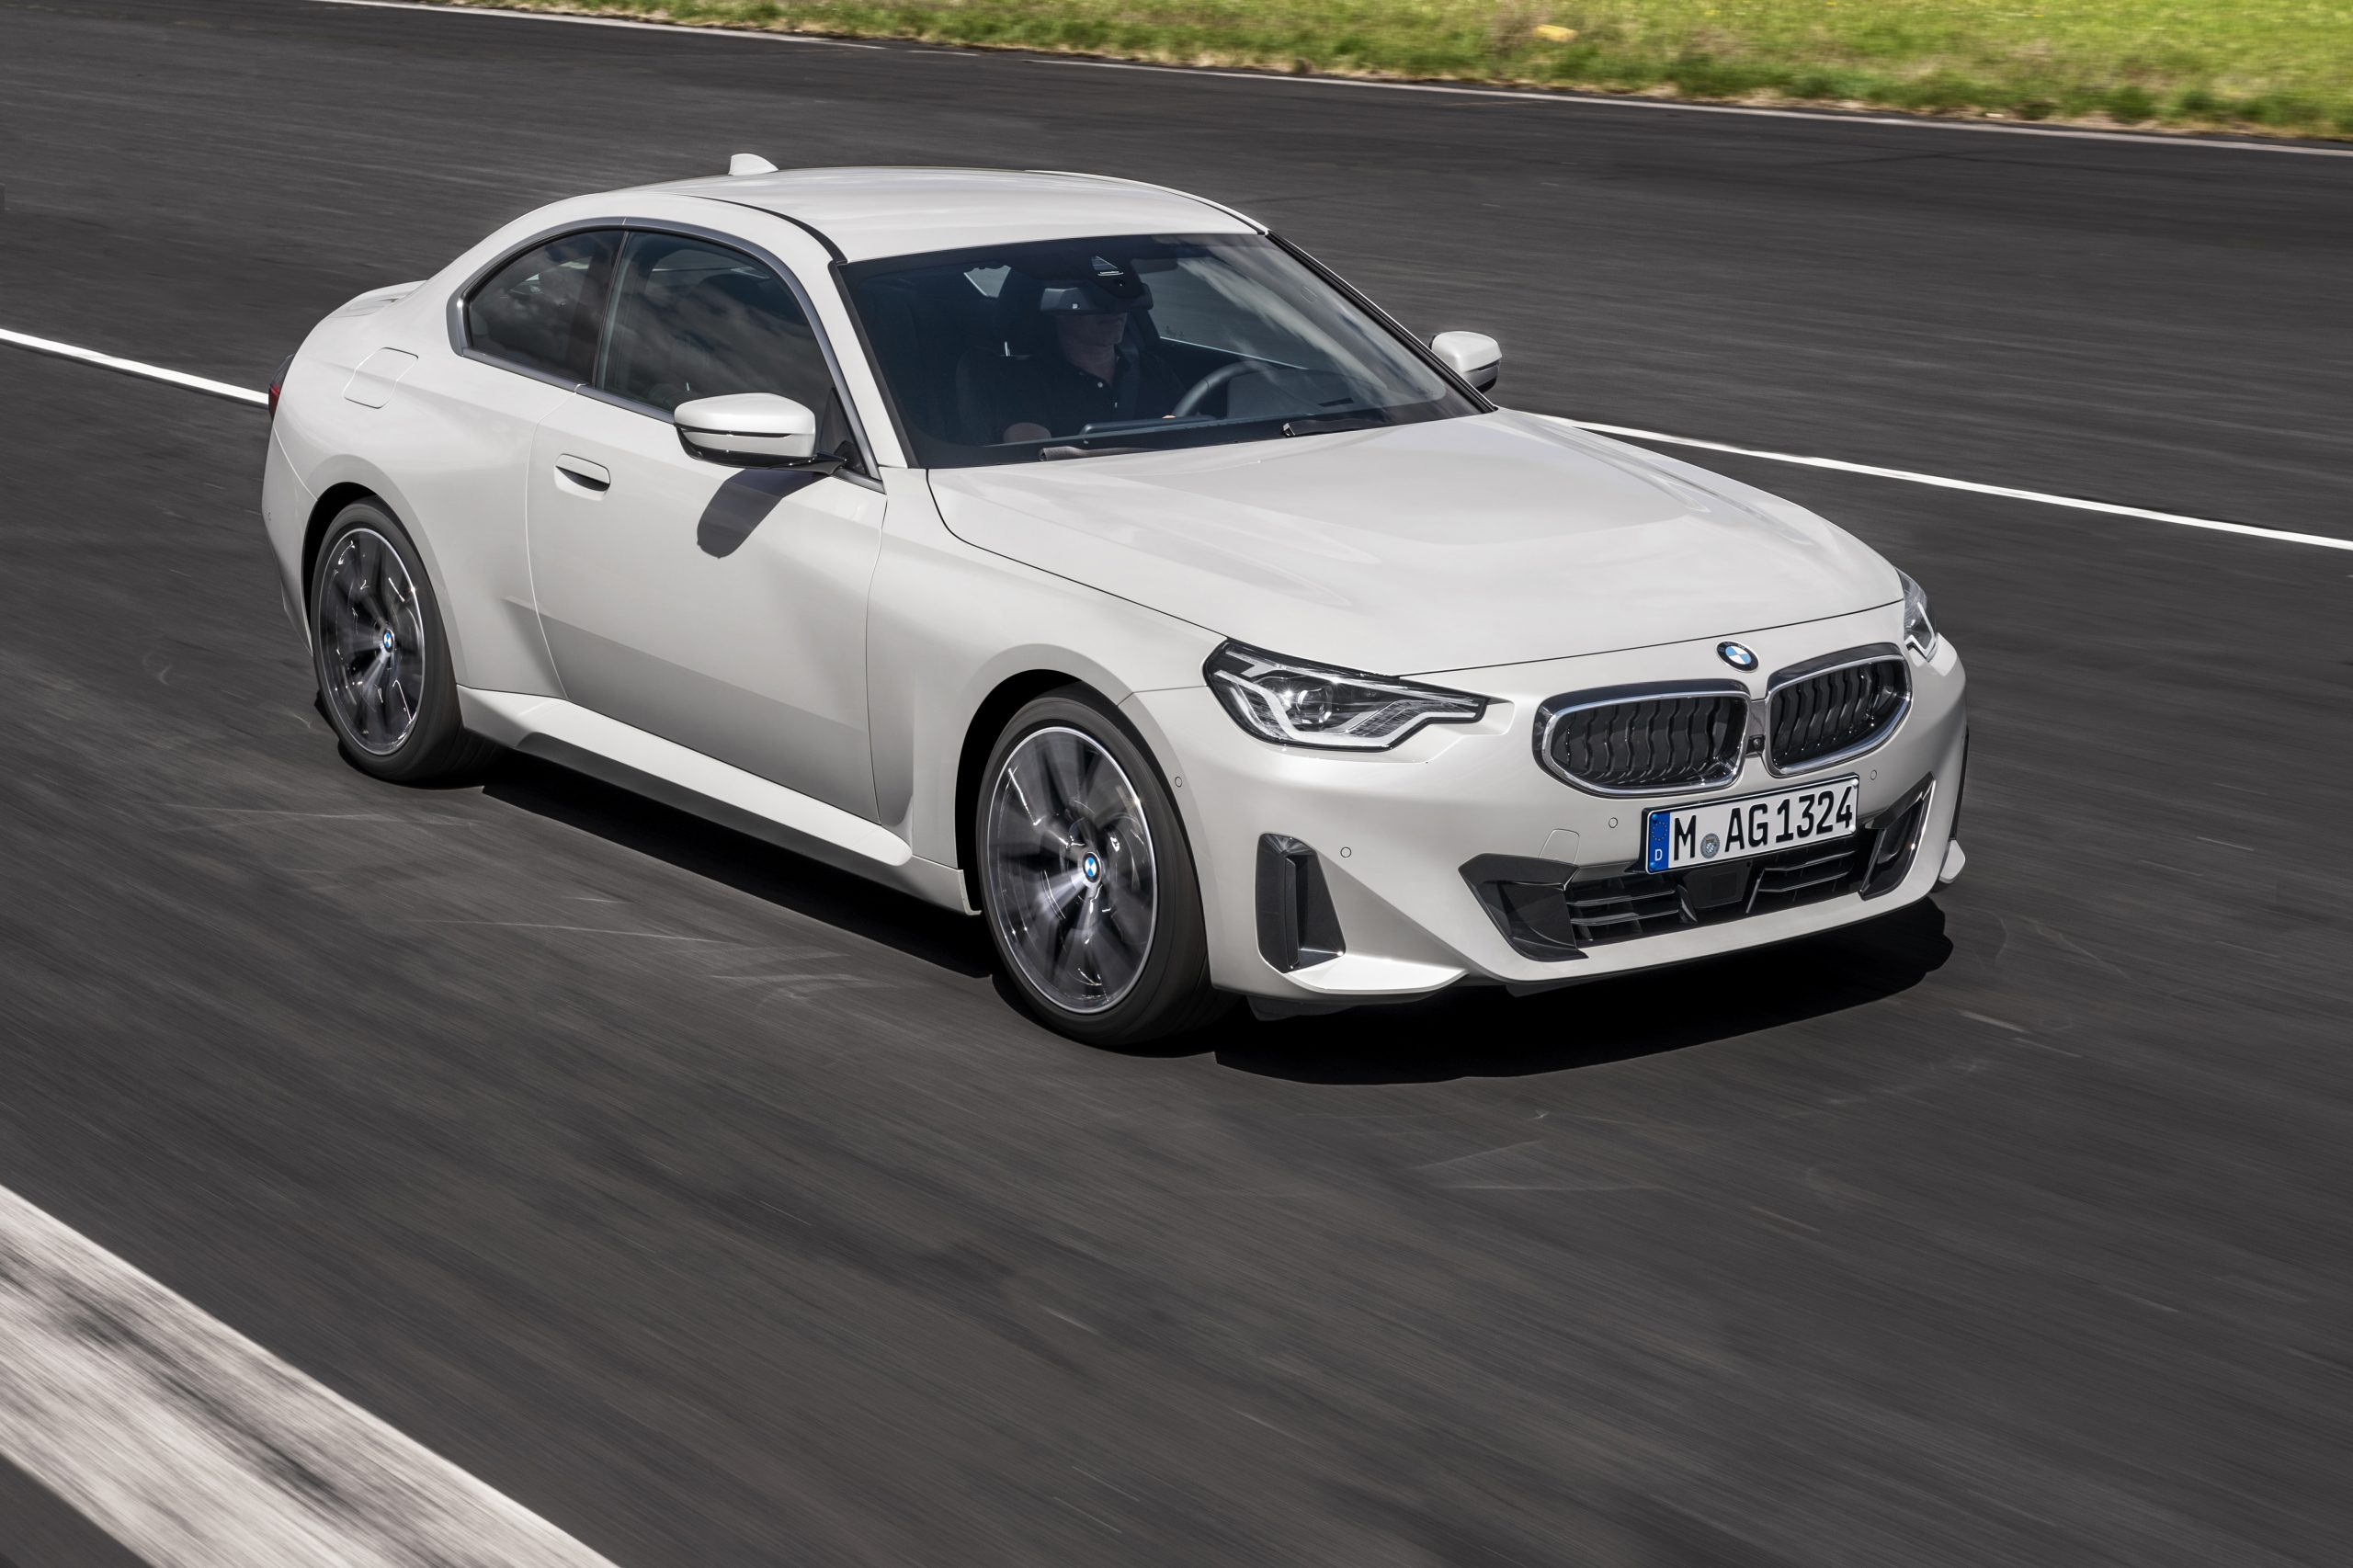 P90428430 highRes scaled Αυτή είναι η νέα BMW Σειρά 2 Coupe BMW, Bmw 2, BMW Σειρά 2, zblog, ειδήσεις, Νέα, Σειρά 2